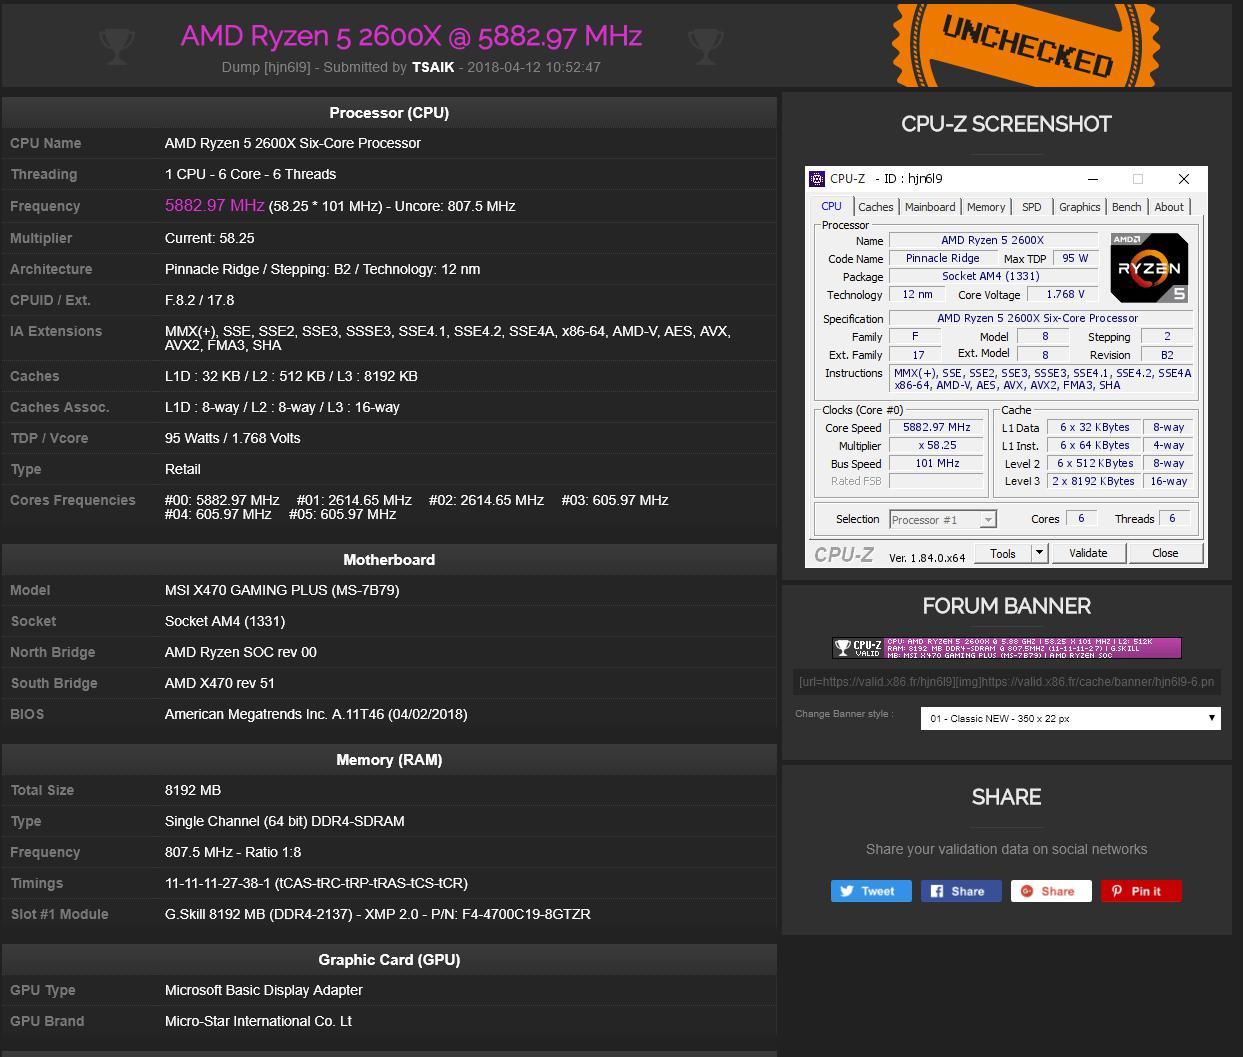 AMD Ryzen overclock